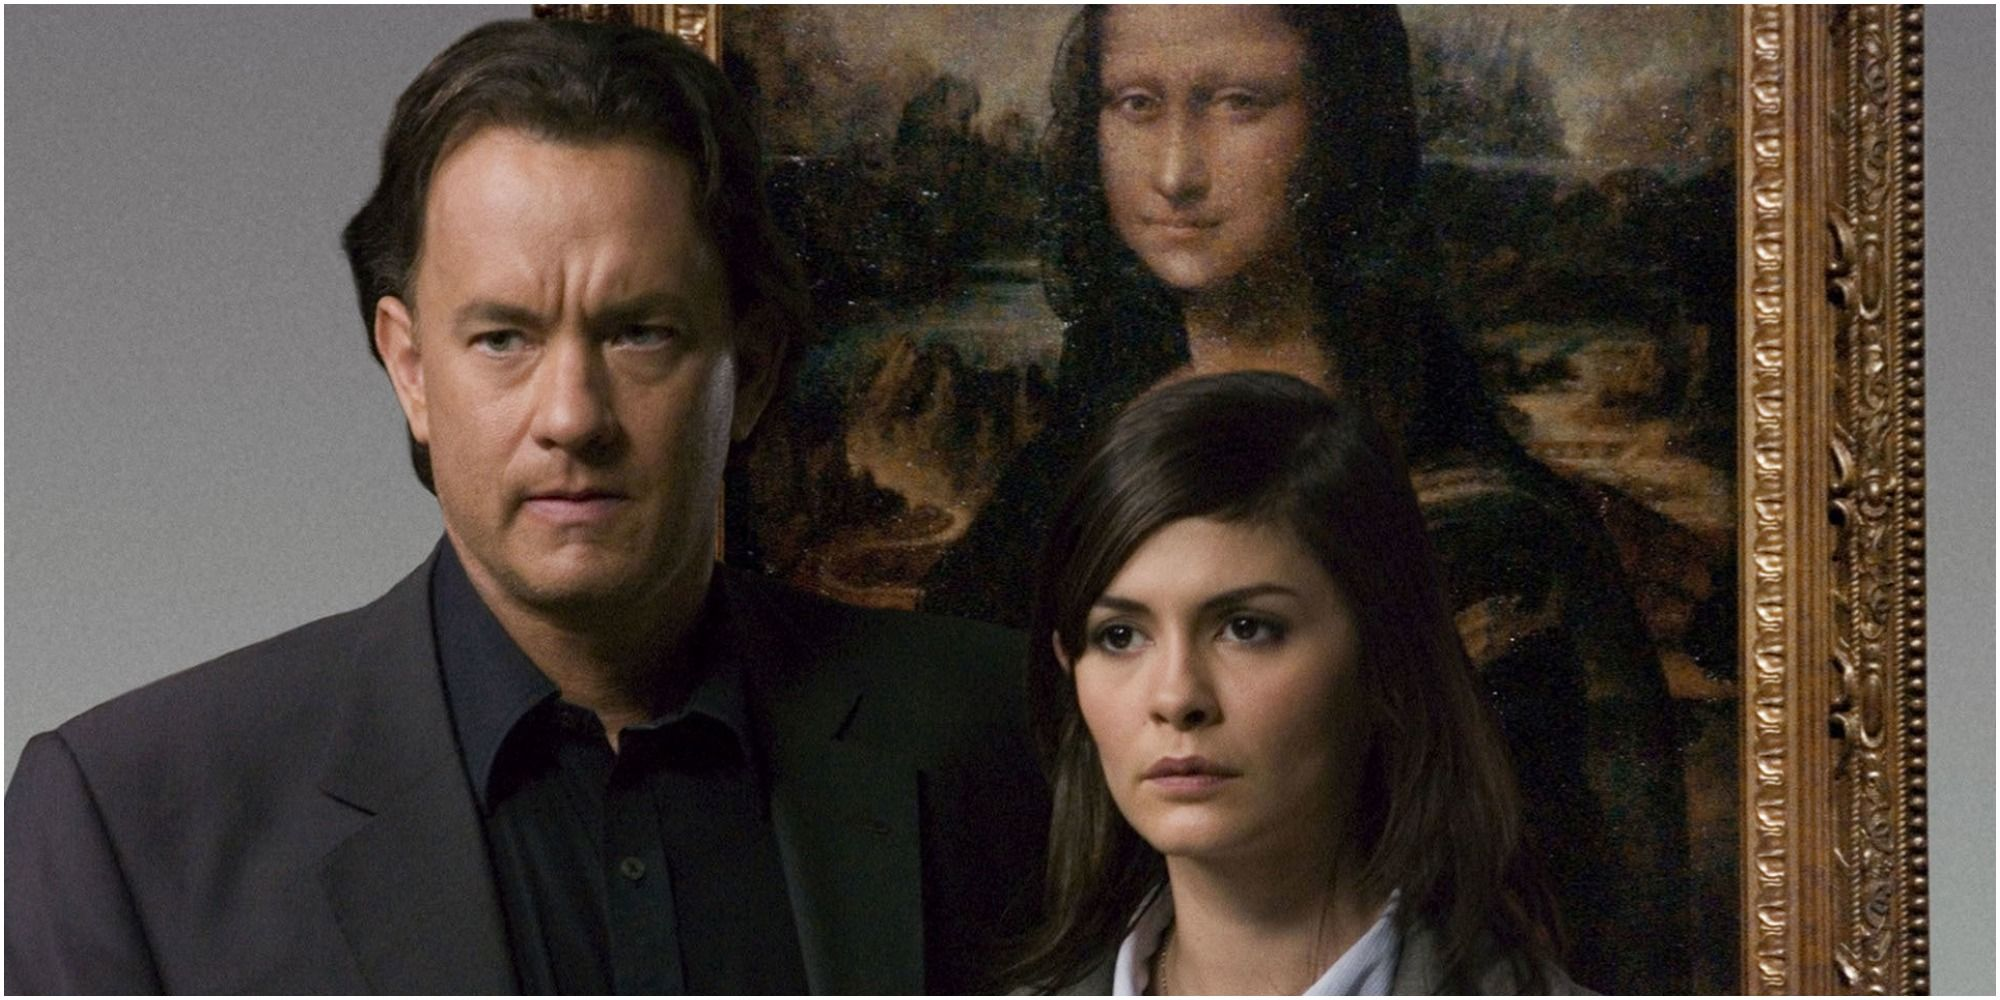 The Da Vinci Code Series In Chronological Order | Screen Rant